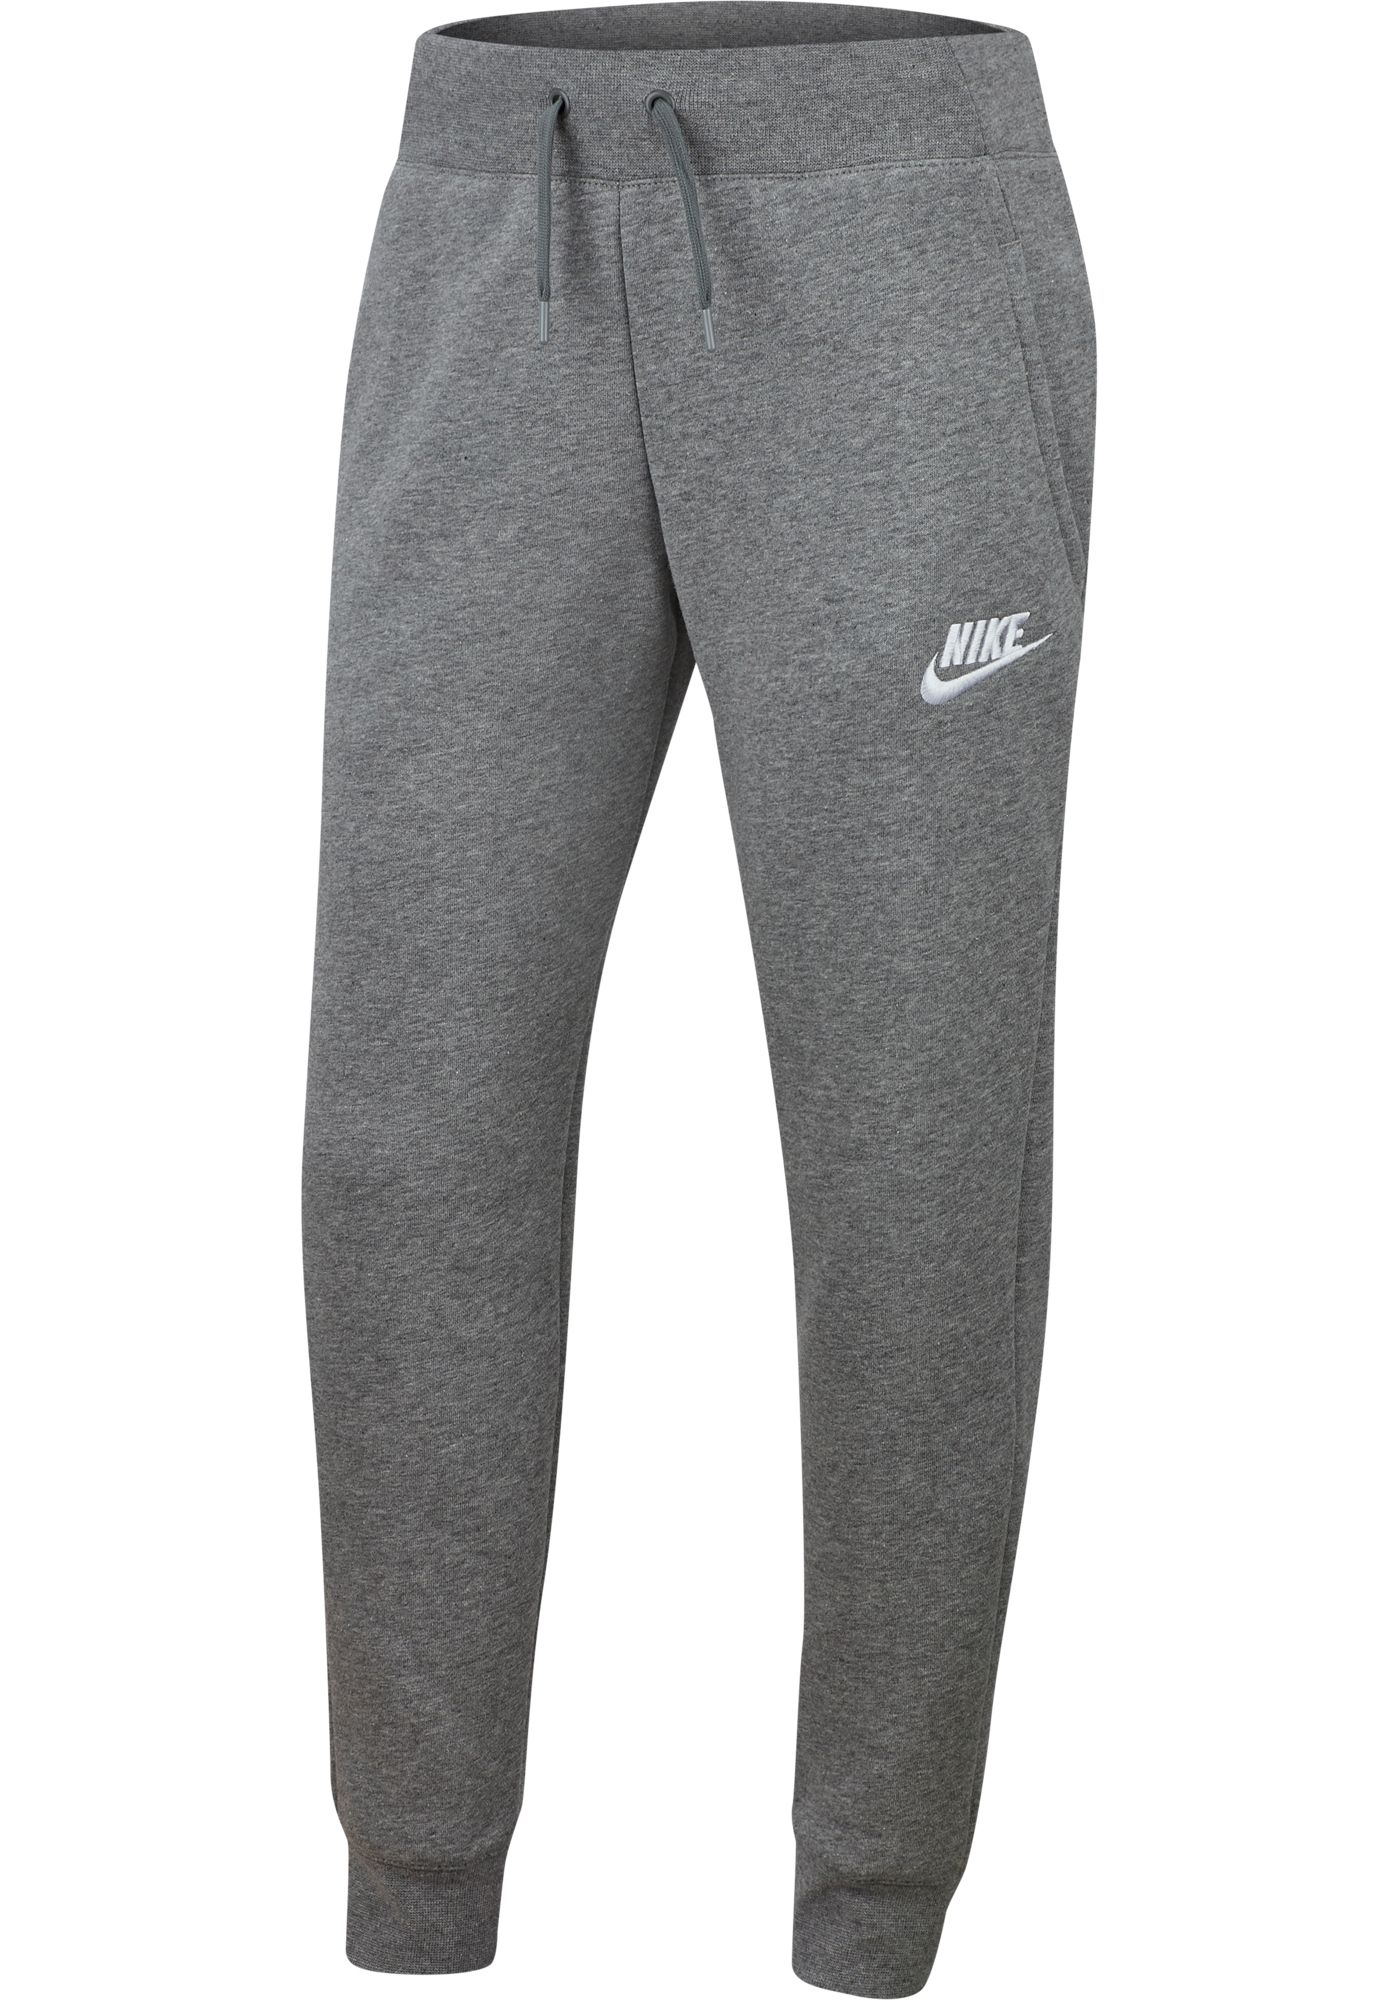 Nike Girls' Sportswear Essentials Pants